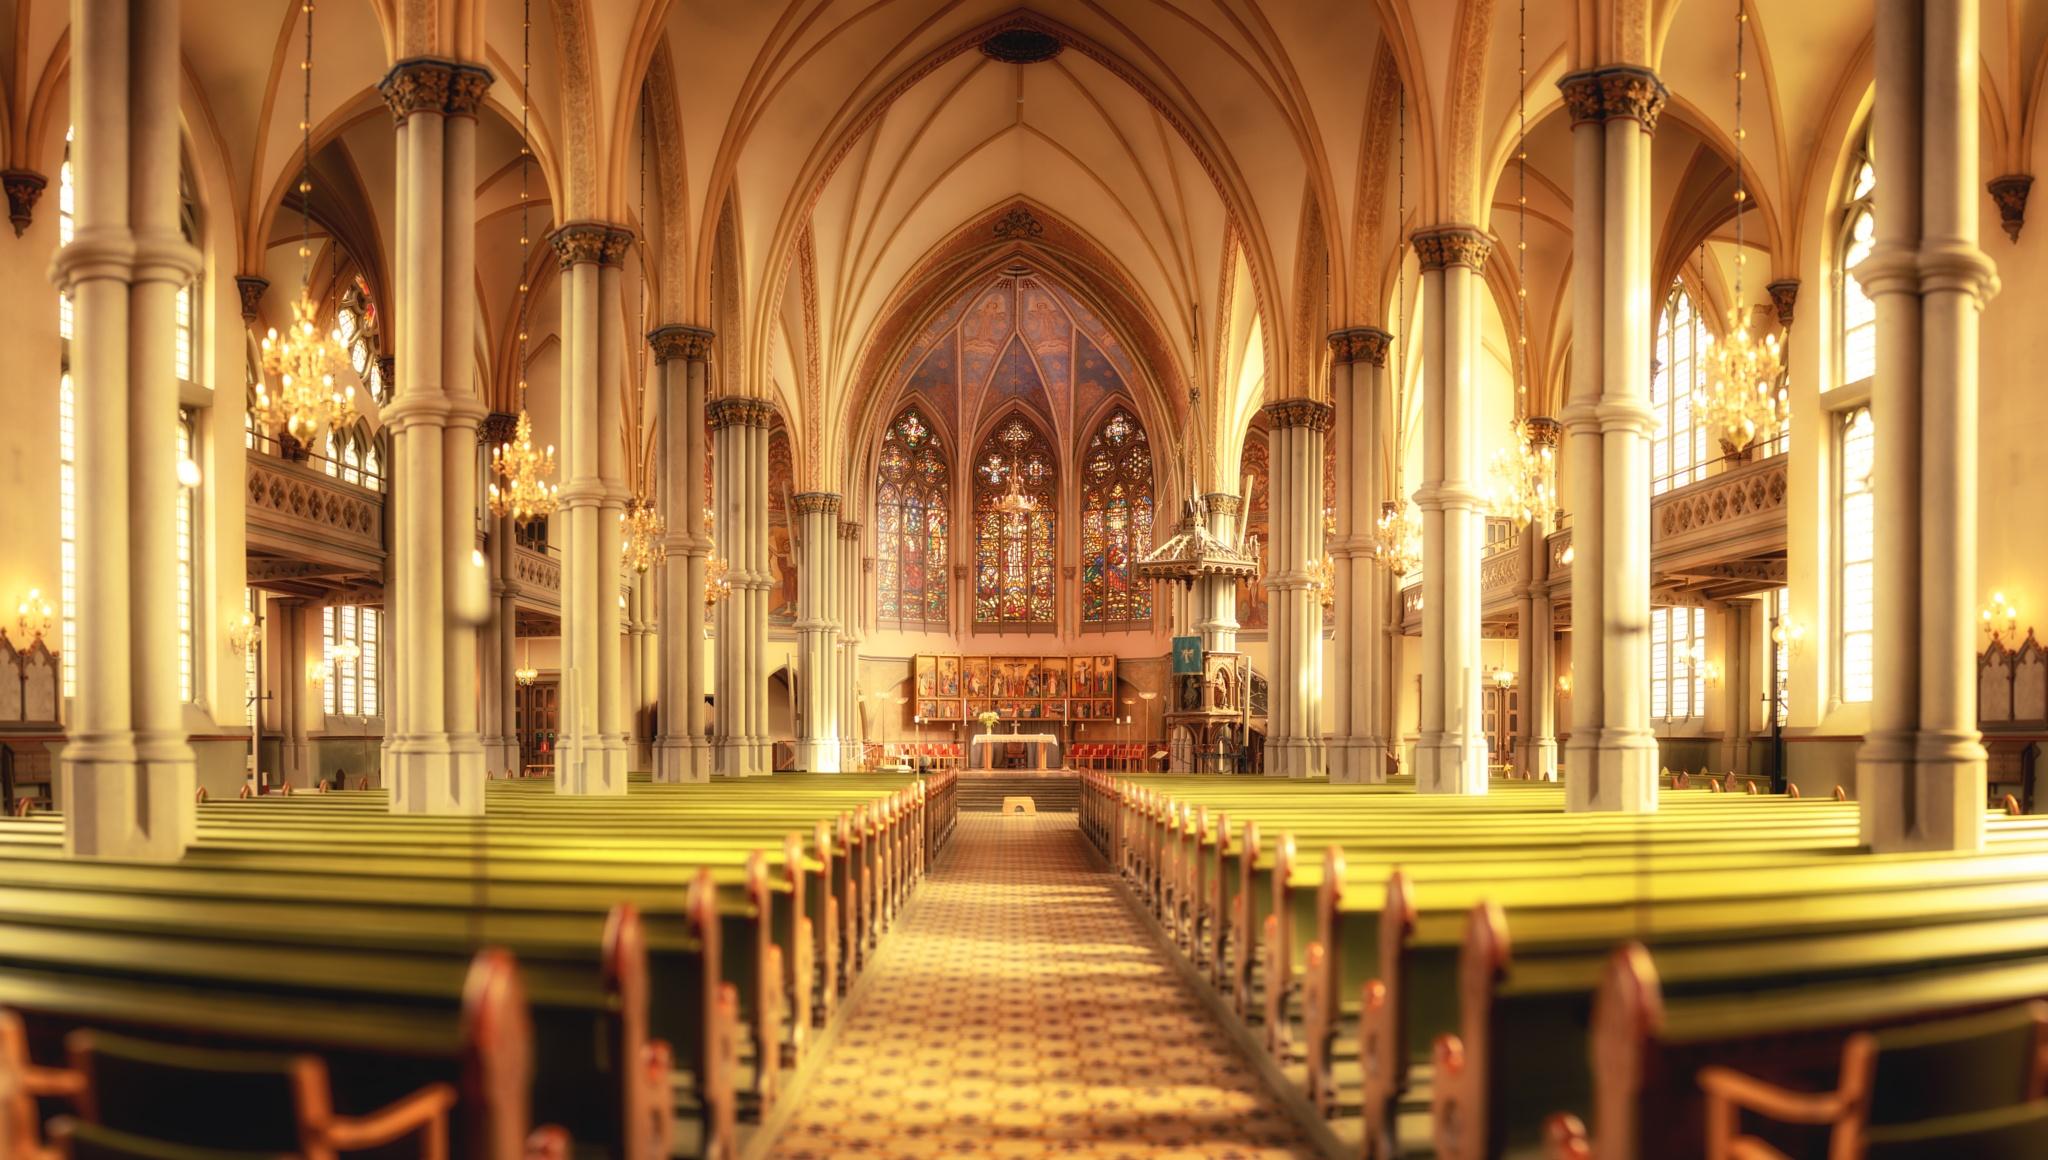 Oscar Fredrik Church by Dominik Bingel